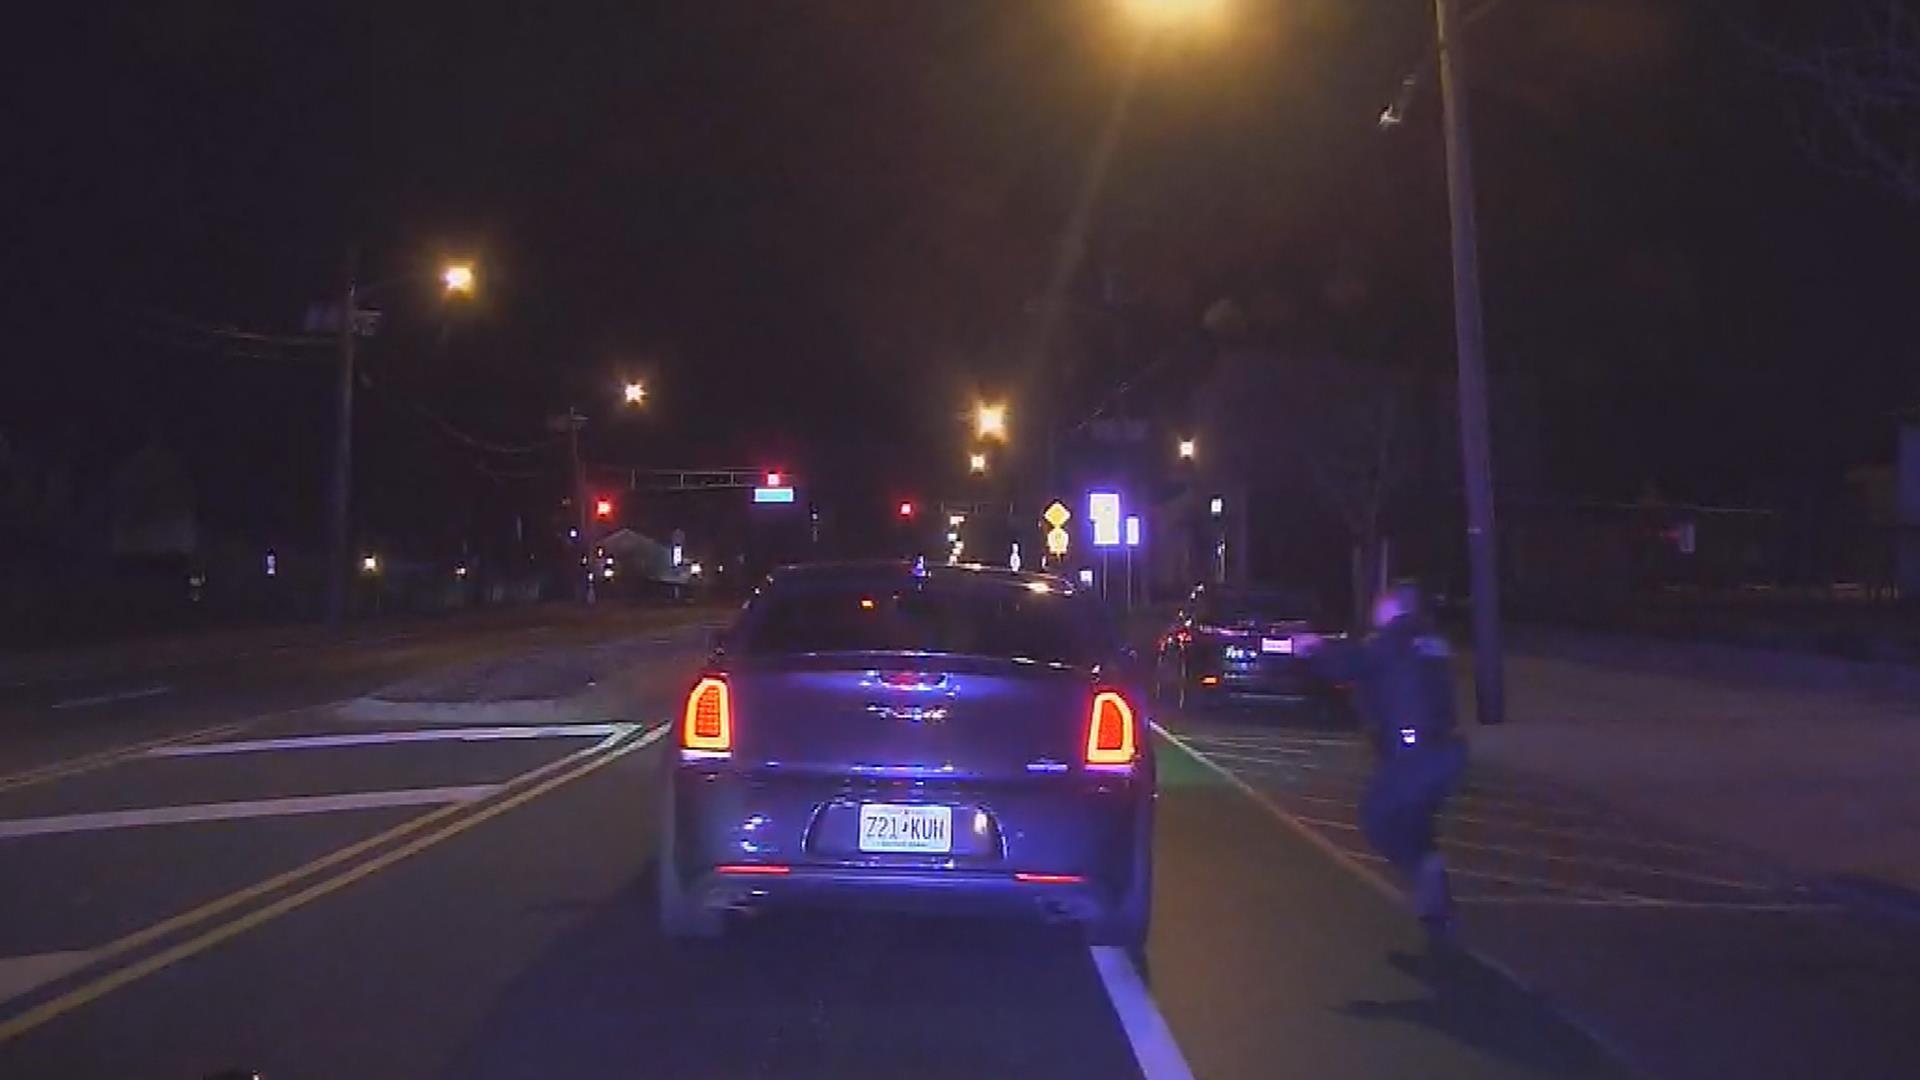 Dashcam and bodycam video captures fatal Newark police shooting